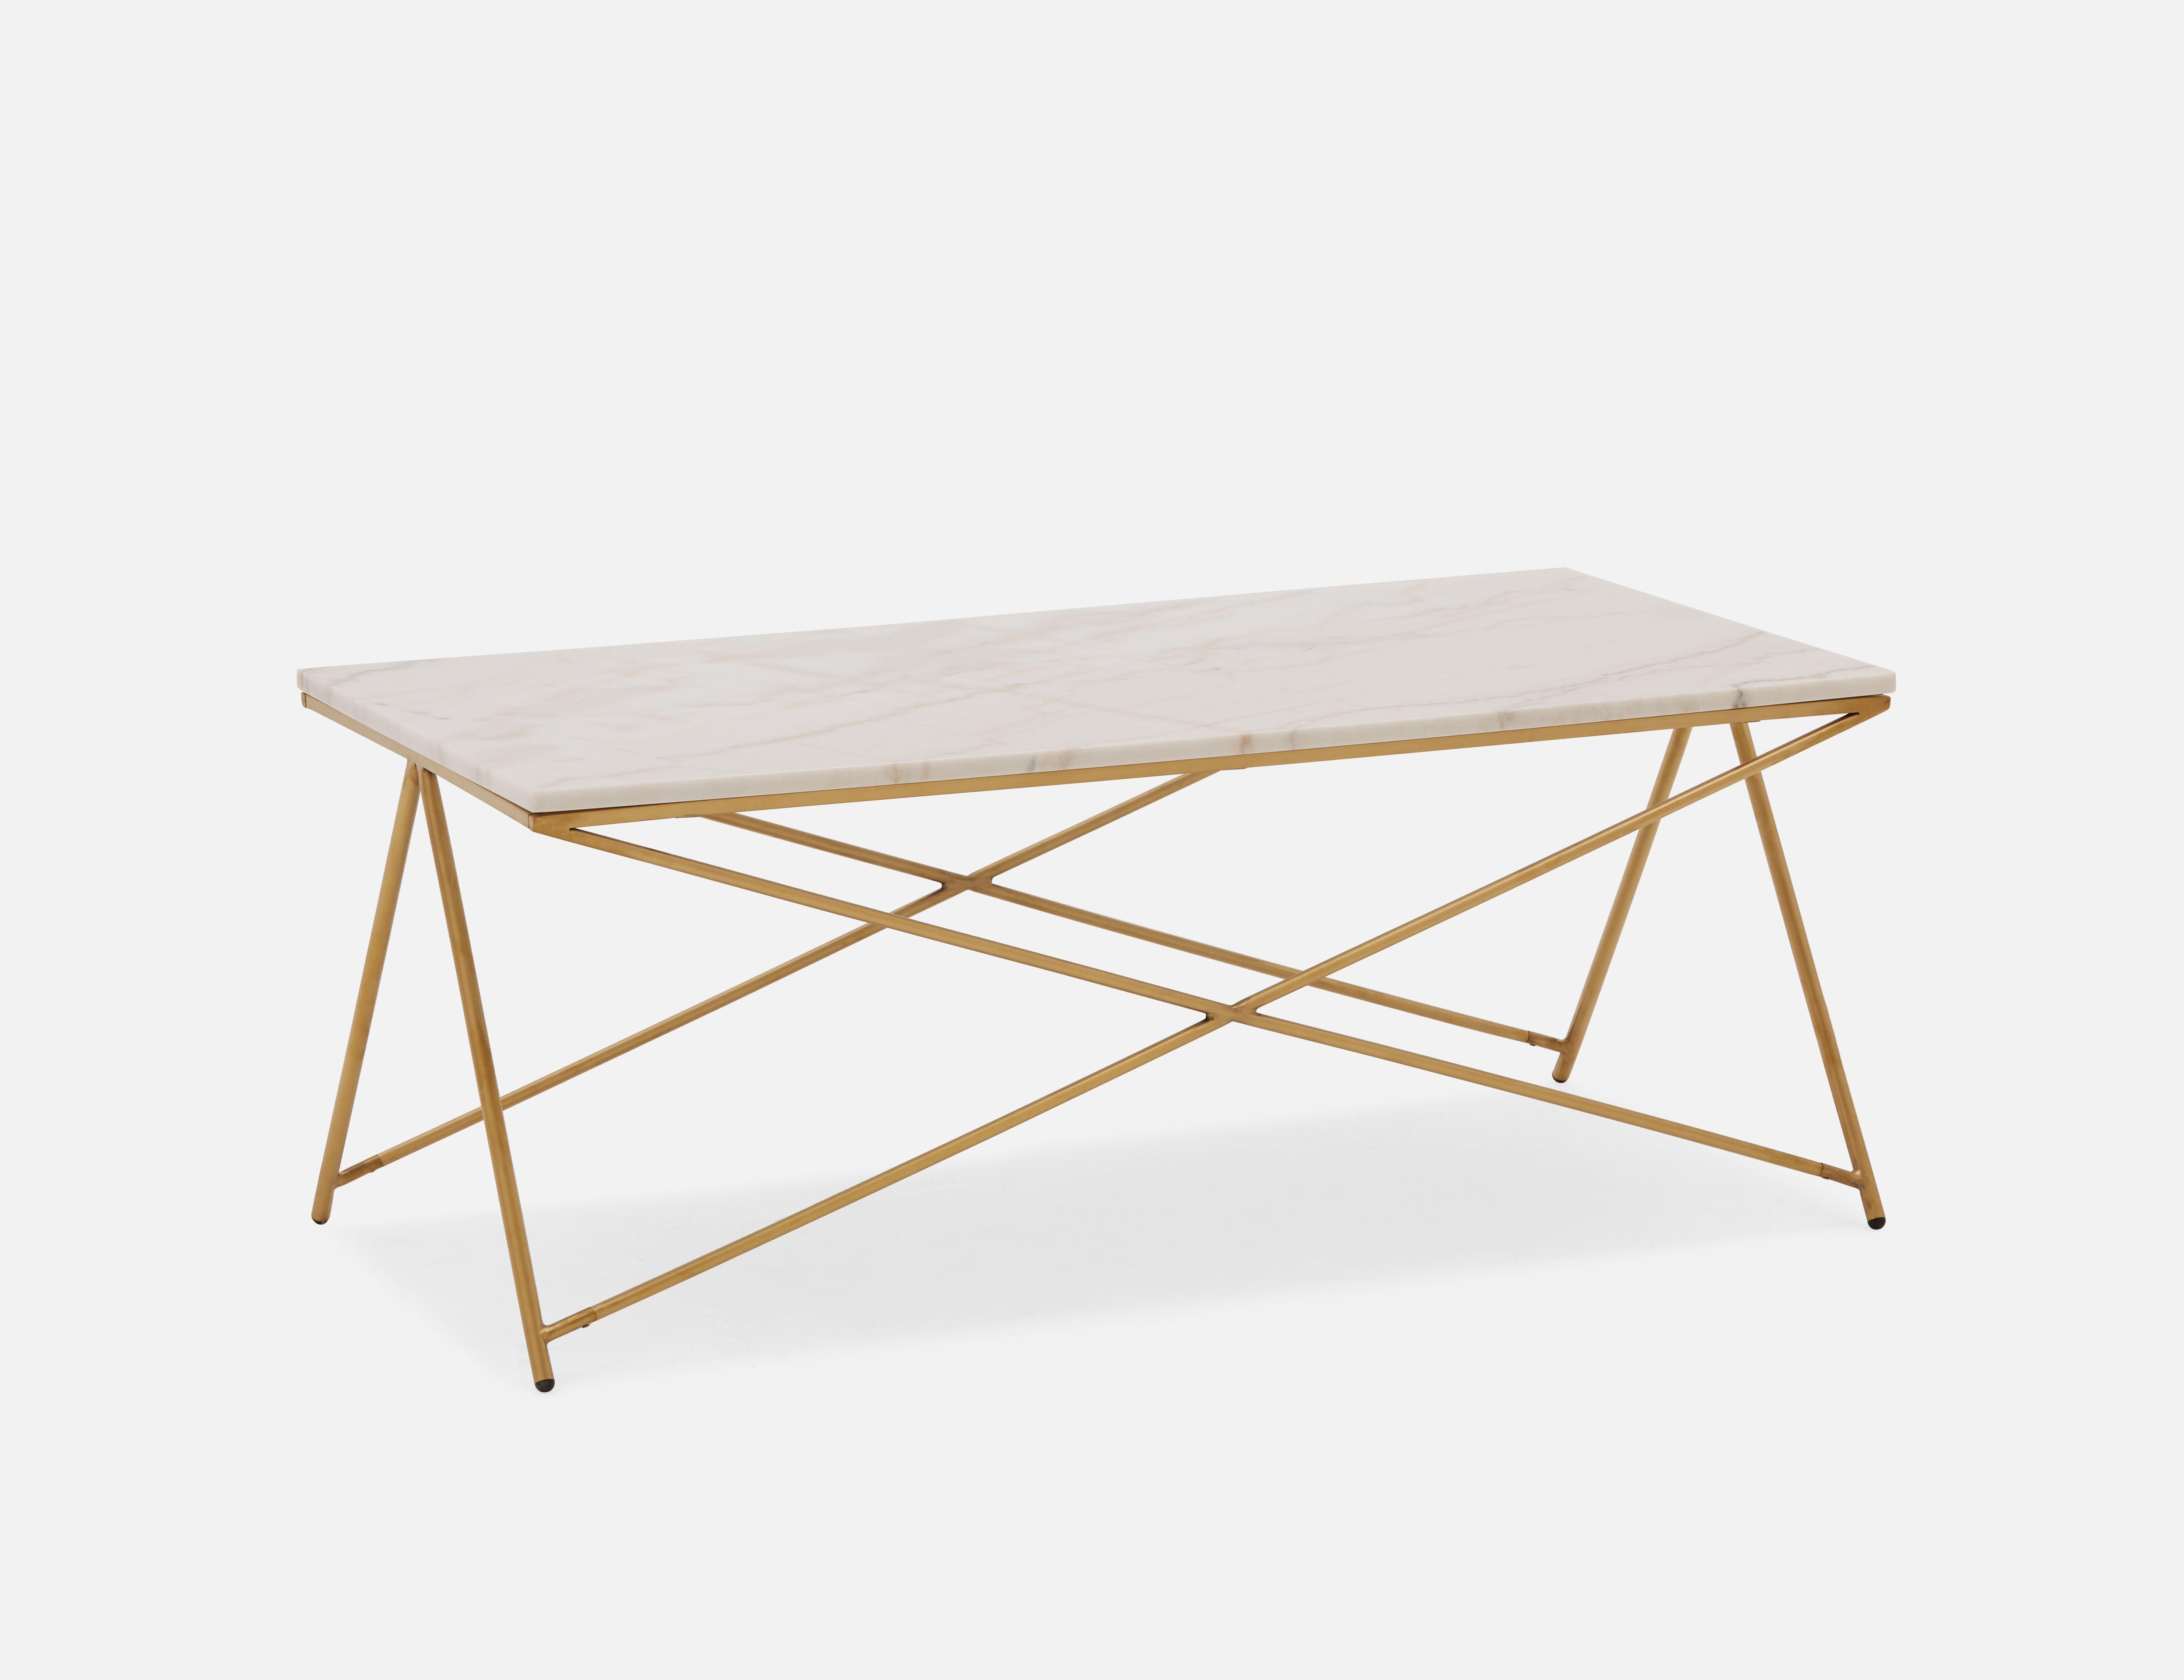 Structube Almond Marble Coffee Table 120cm Etta Coffee Table Marble Coffee Table Marble End Tables [ 3840 x 4992 Pixel ]